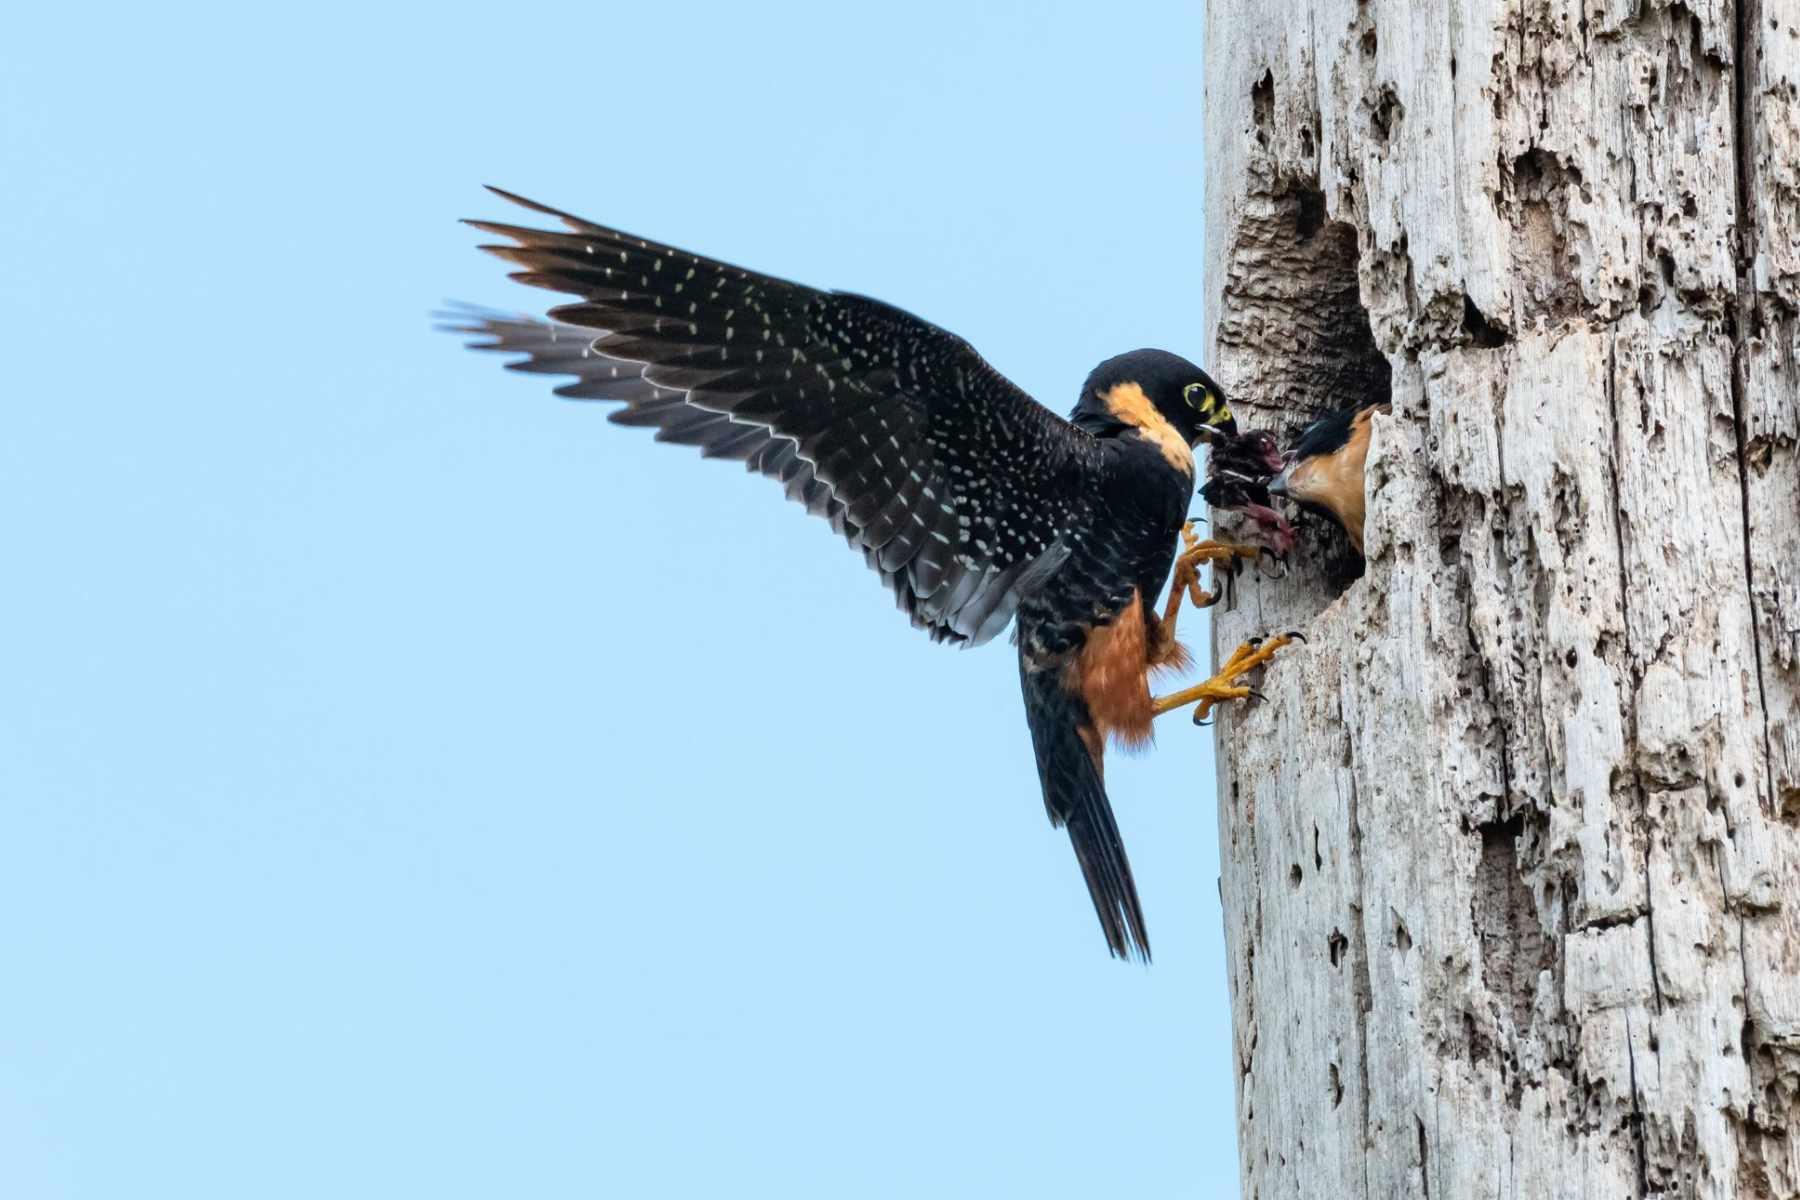 black bat falcon on tree trunk with wings fanned back